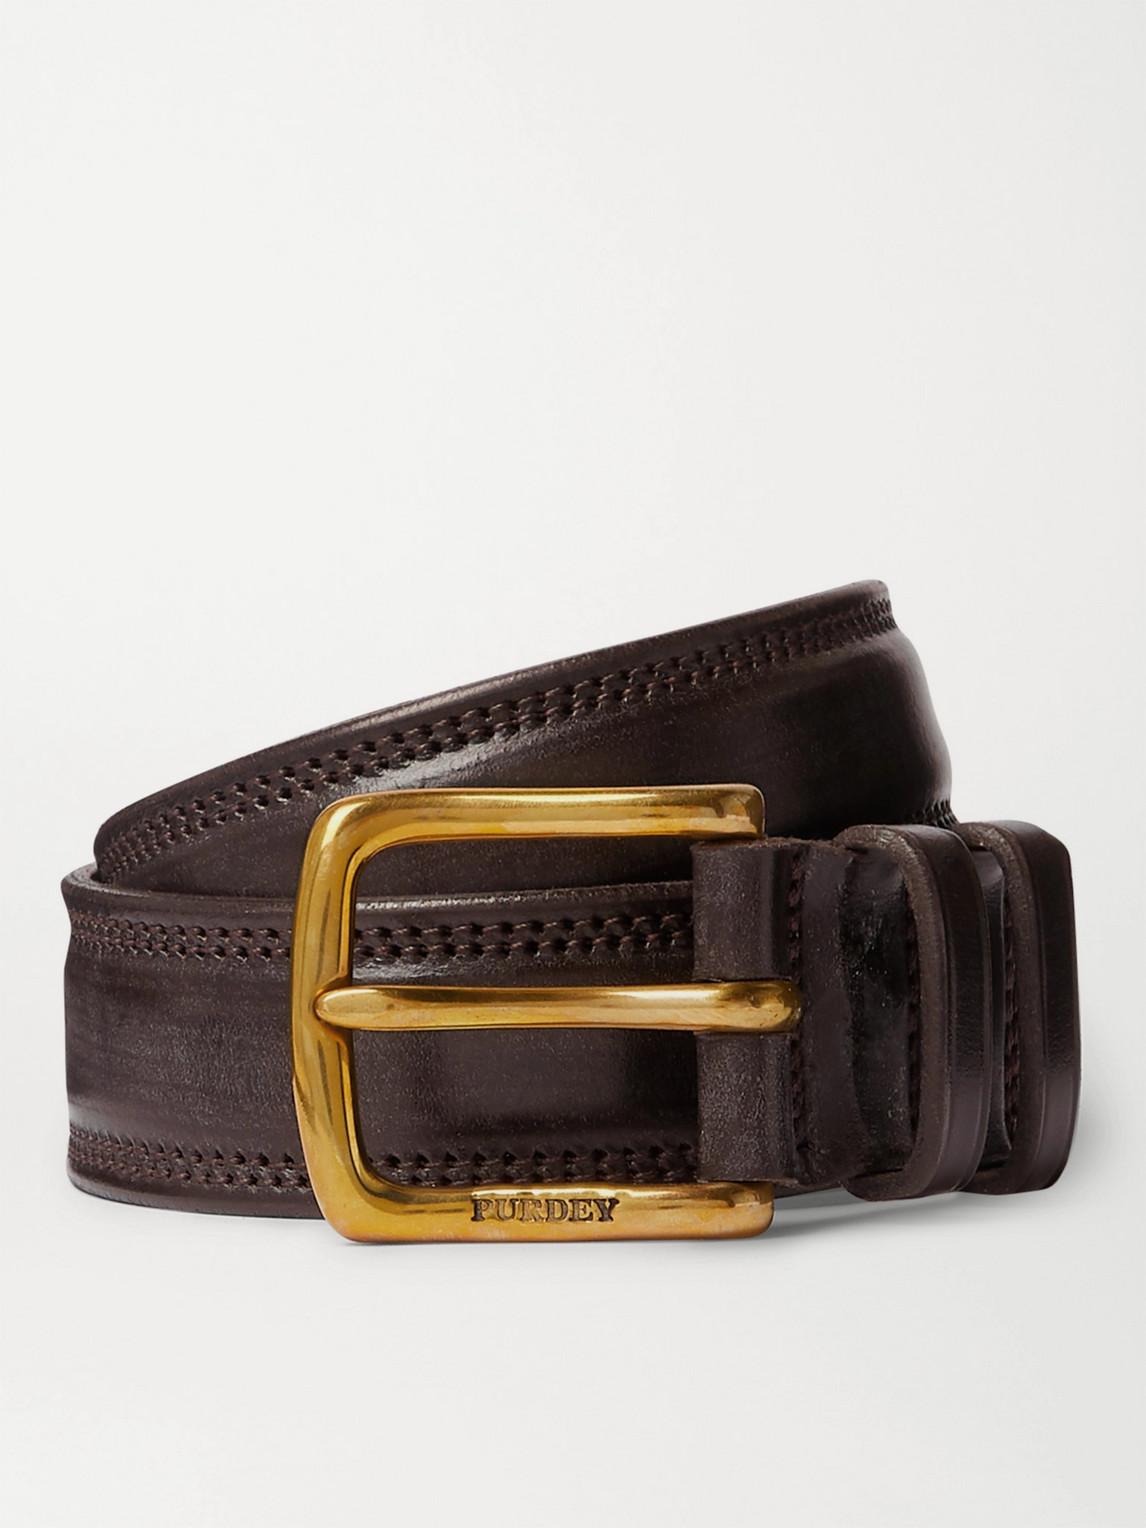 Purdey 4cm Leather Belt In Brown